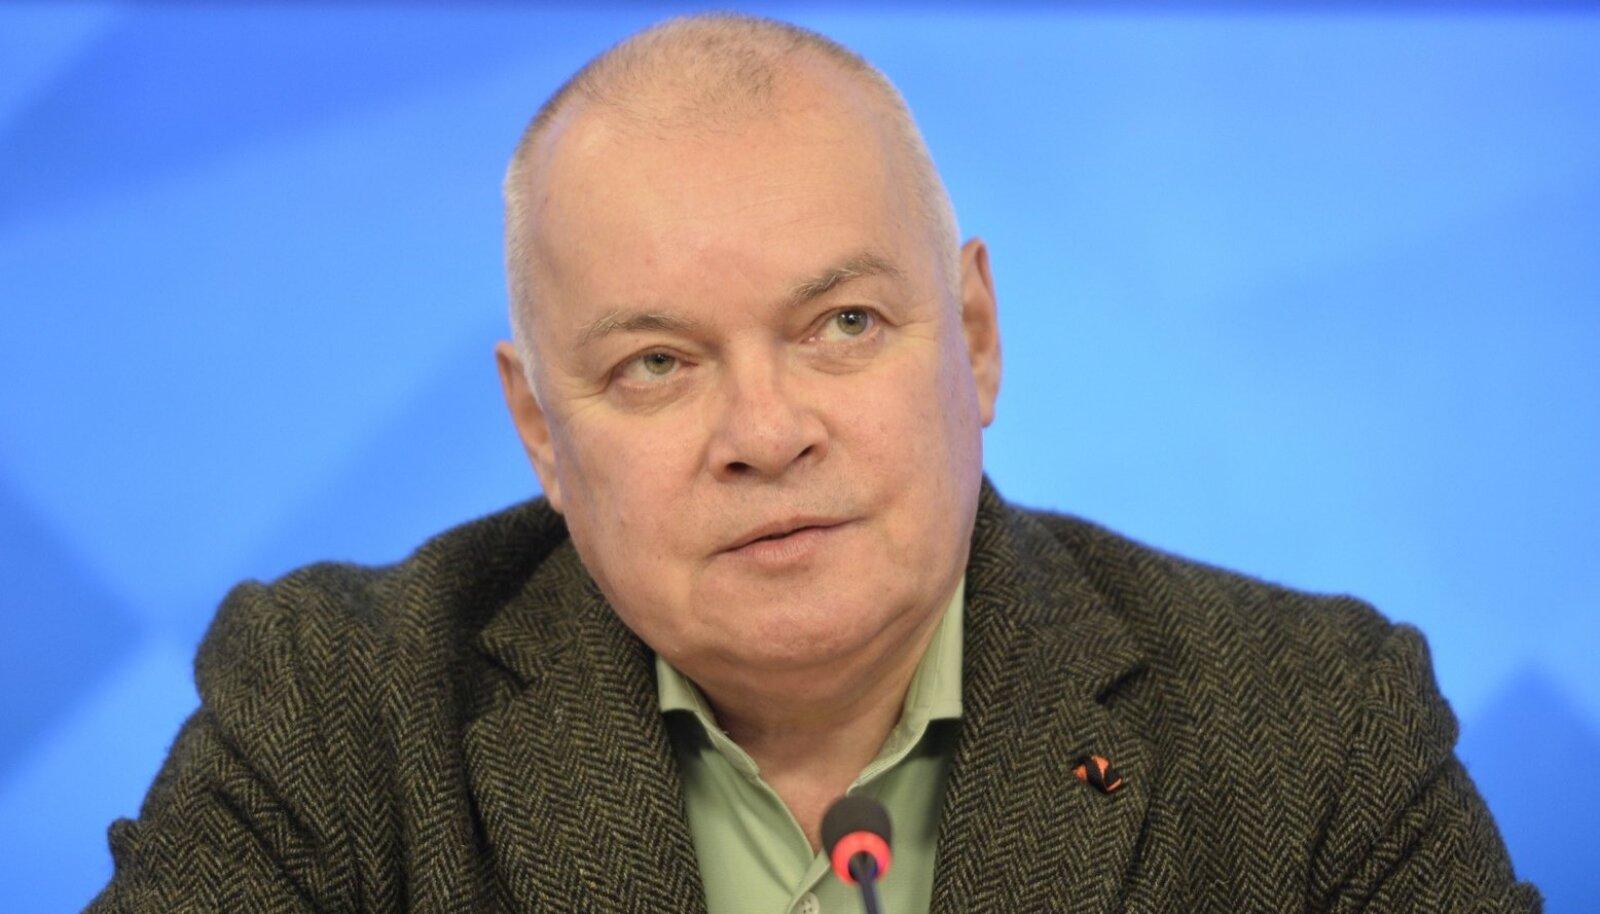 Dmitri Kisseljov